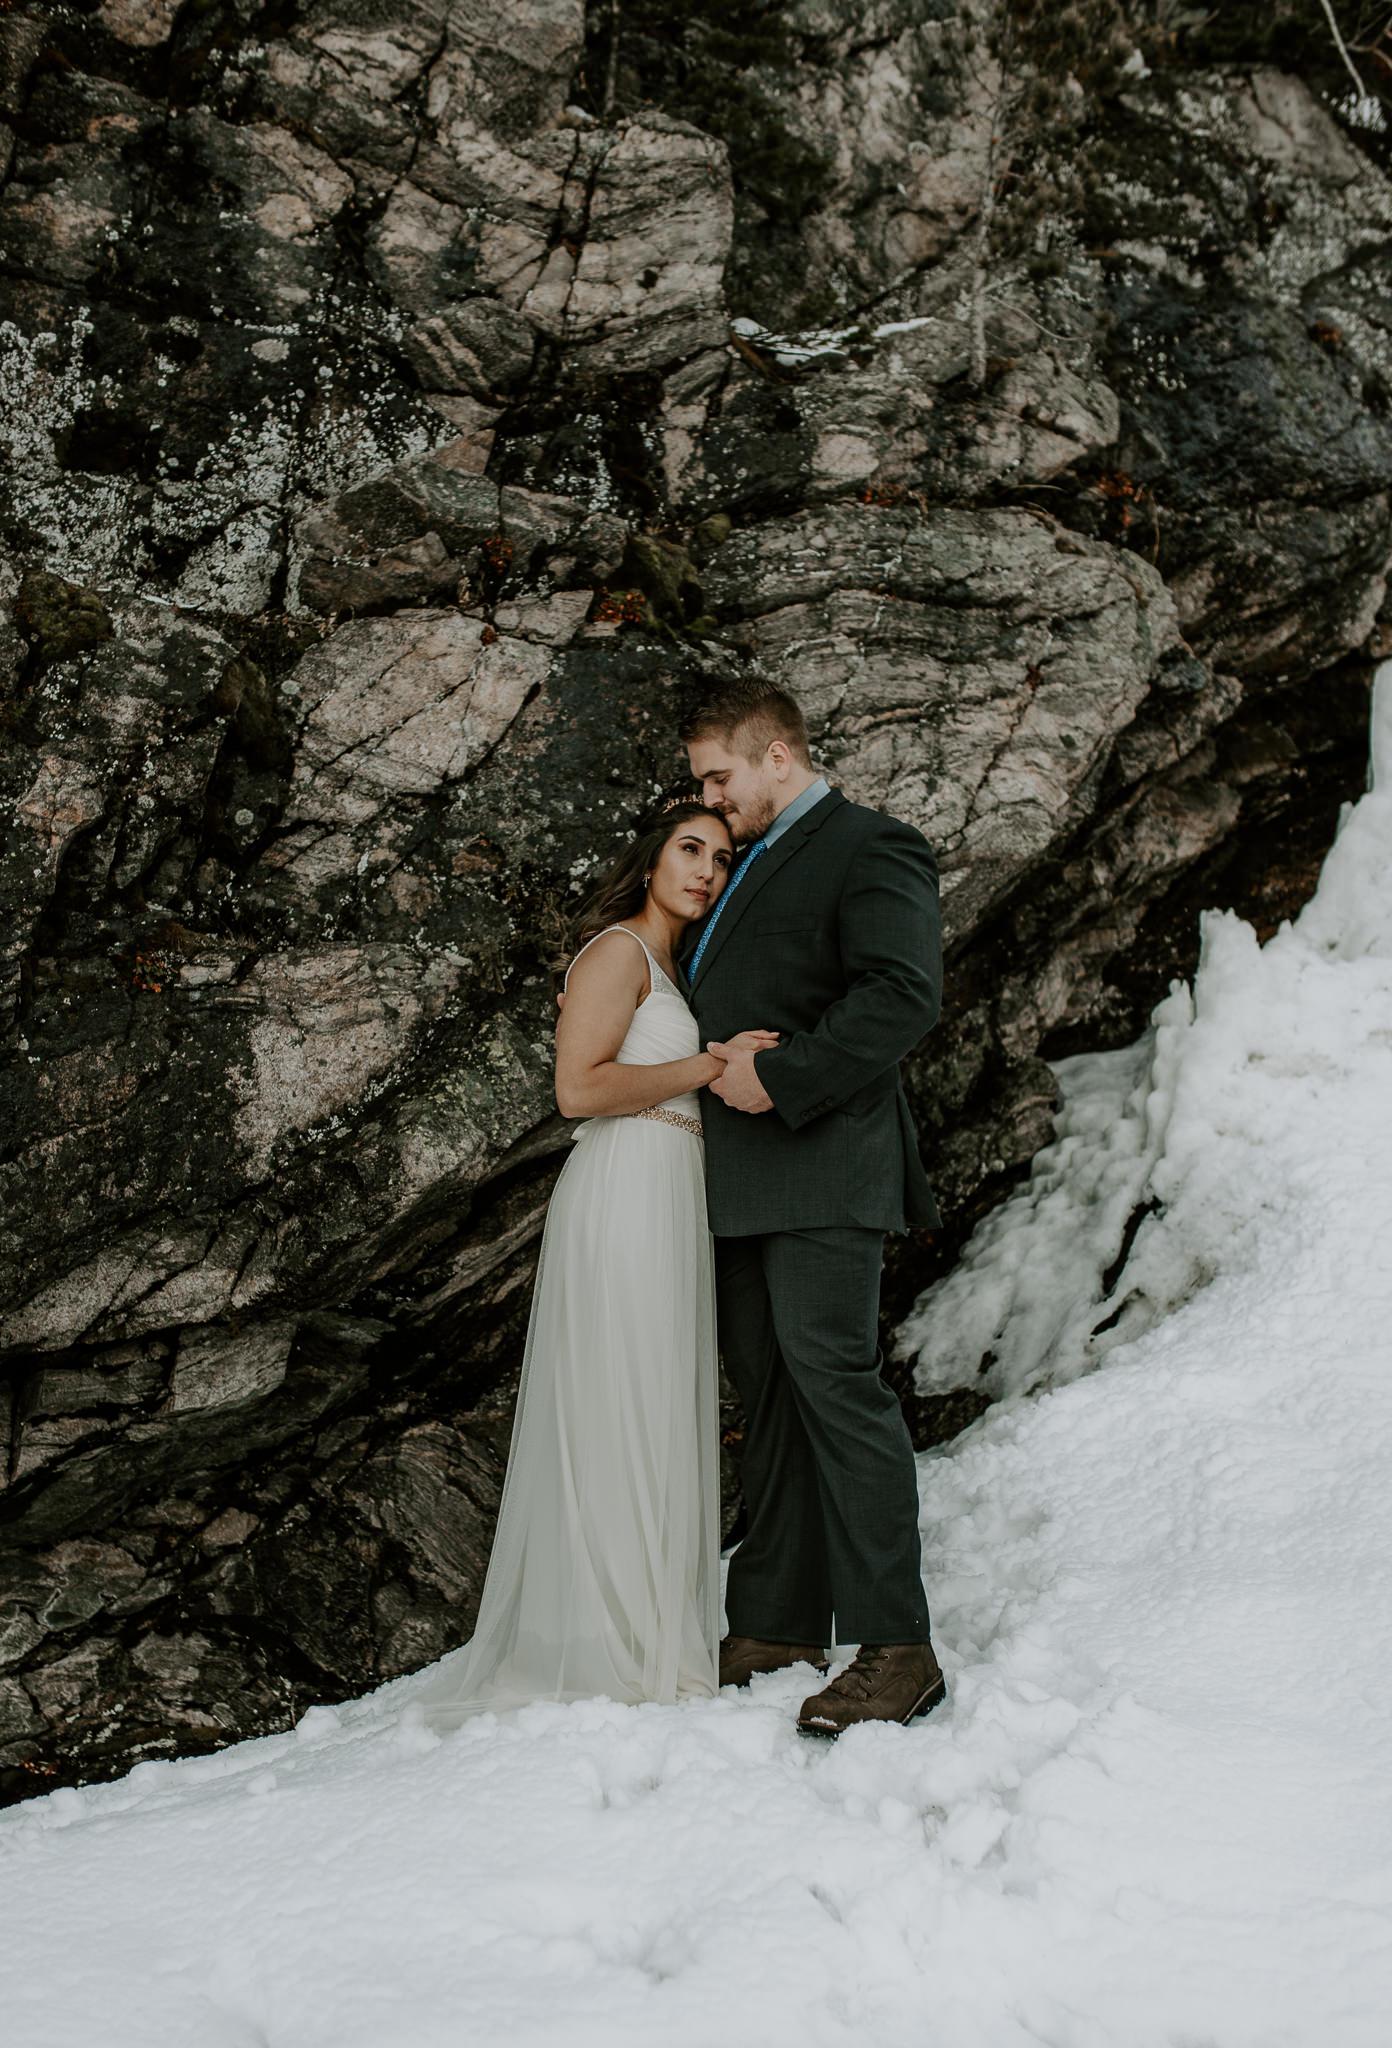 Hiking adventure elopement in Colorado